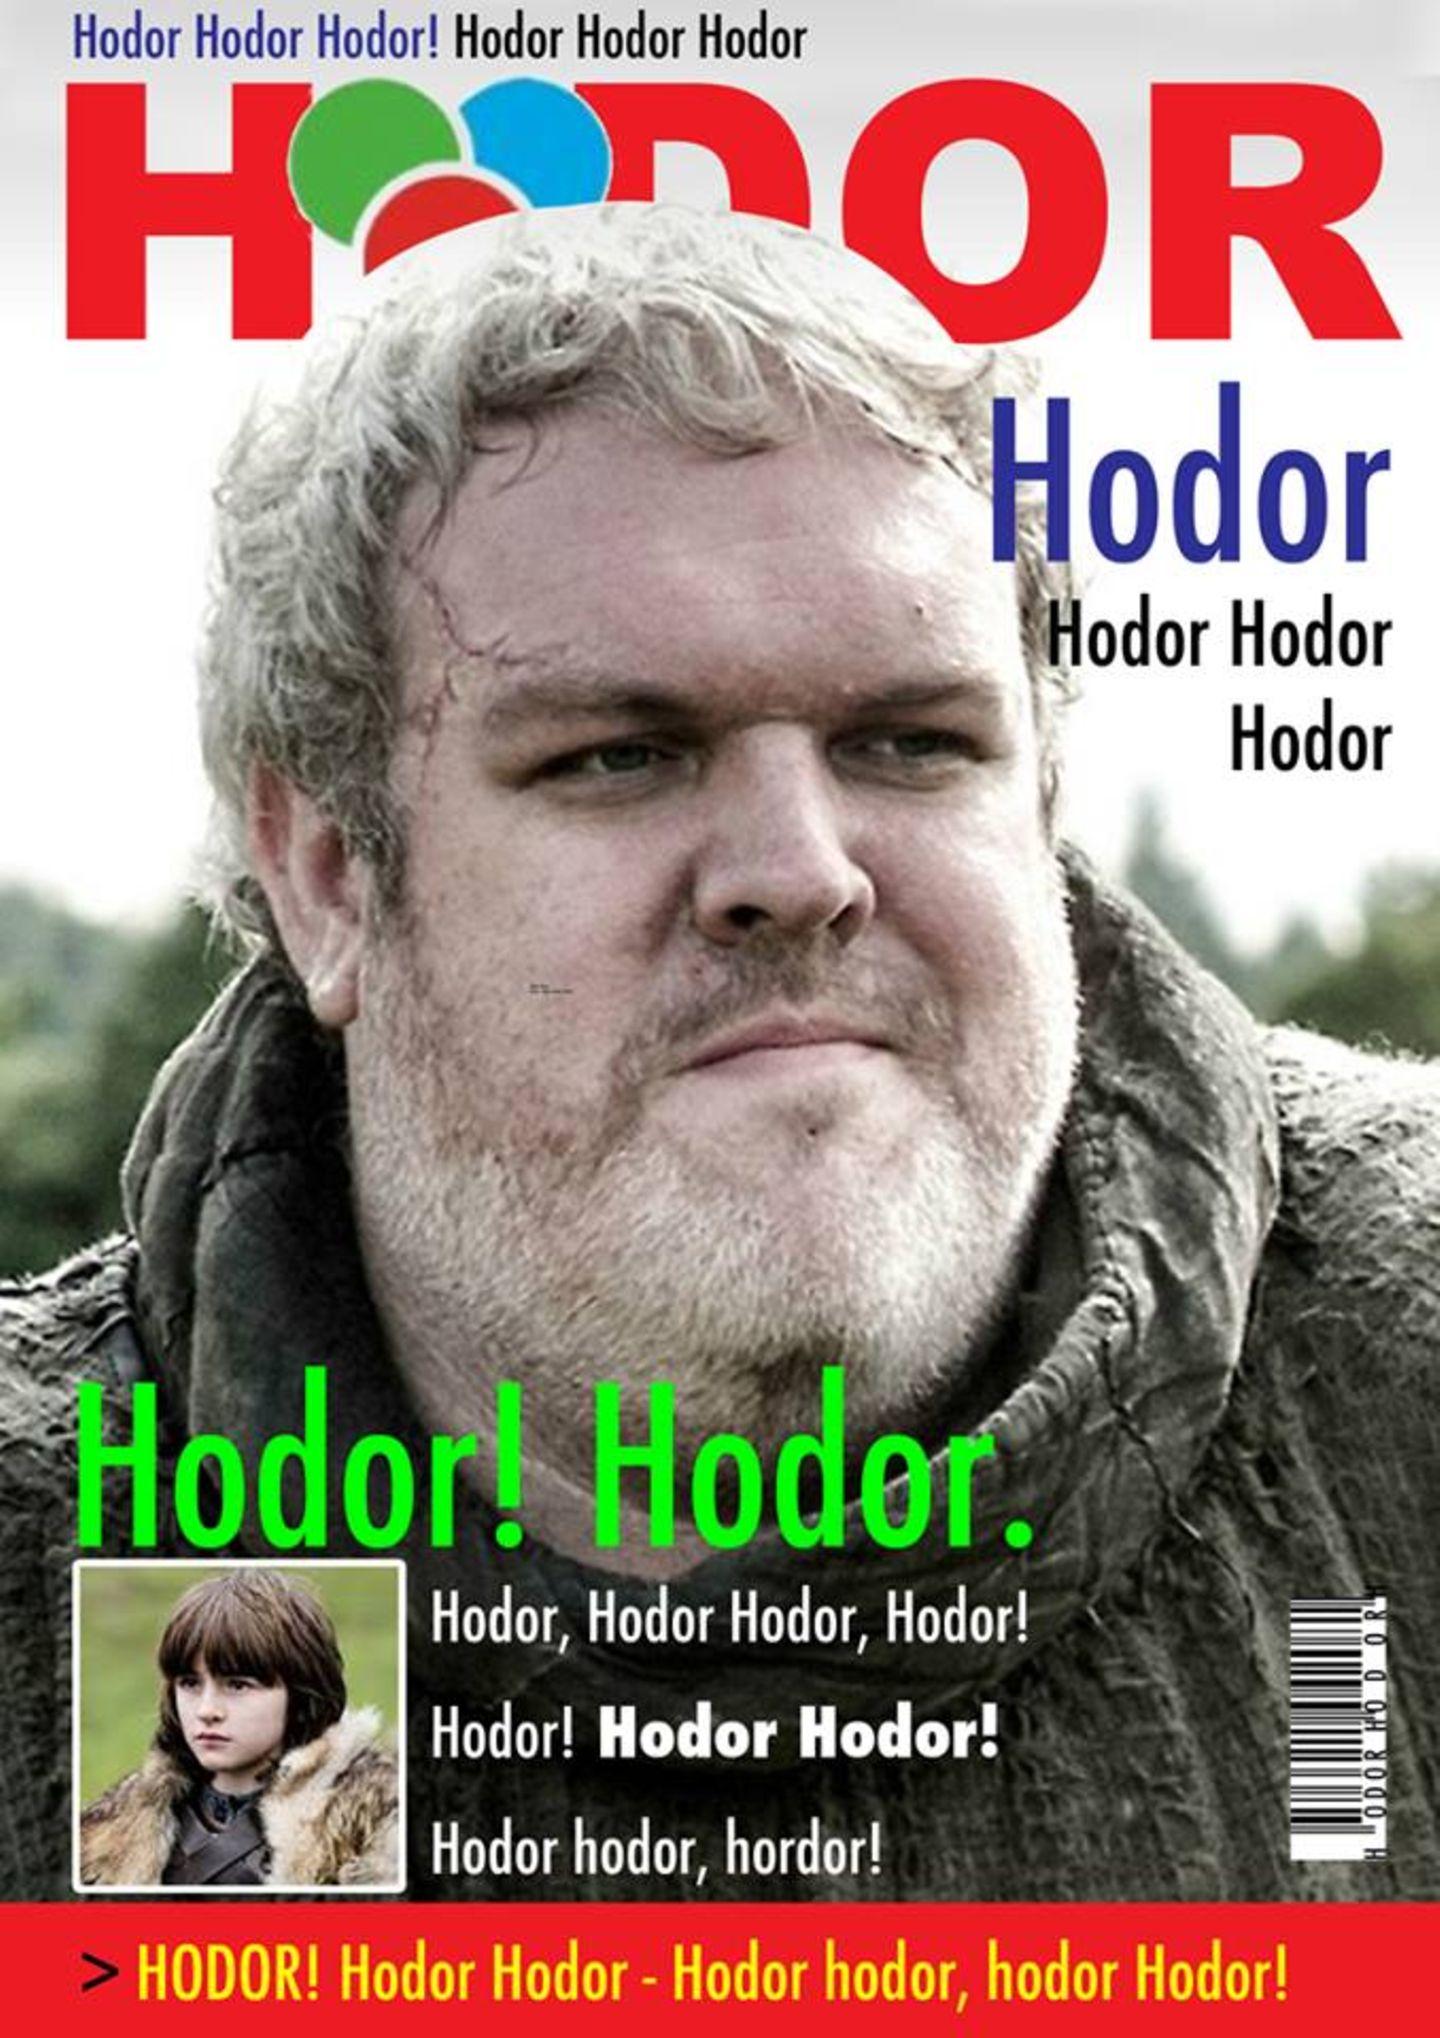 Hodor. Hodor, Hodor? Hodor - Hodor Hodor!